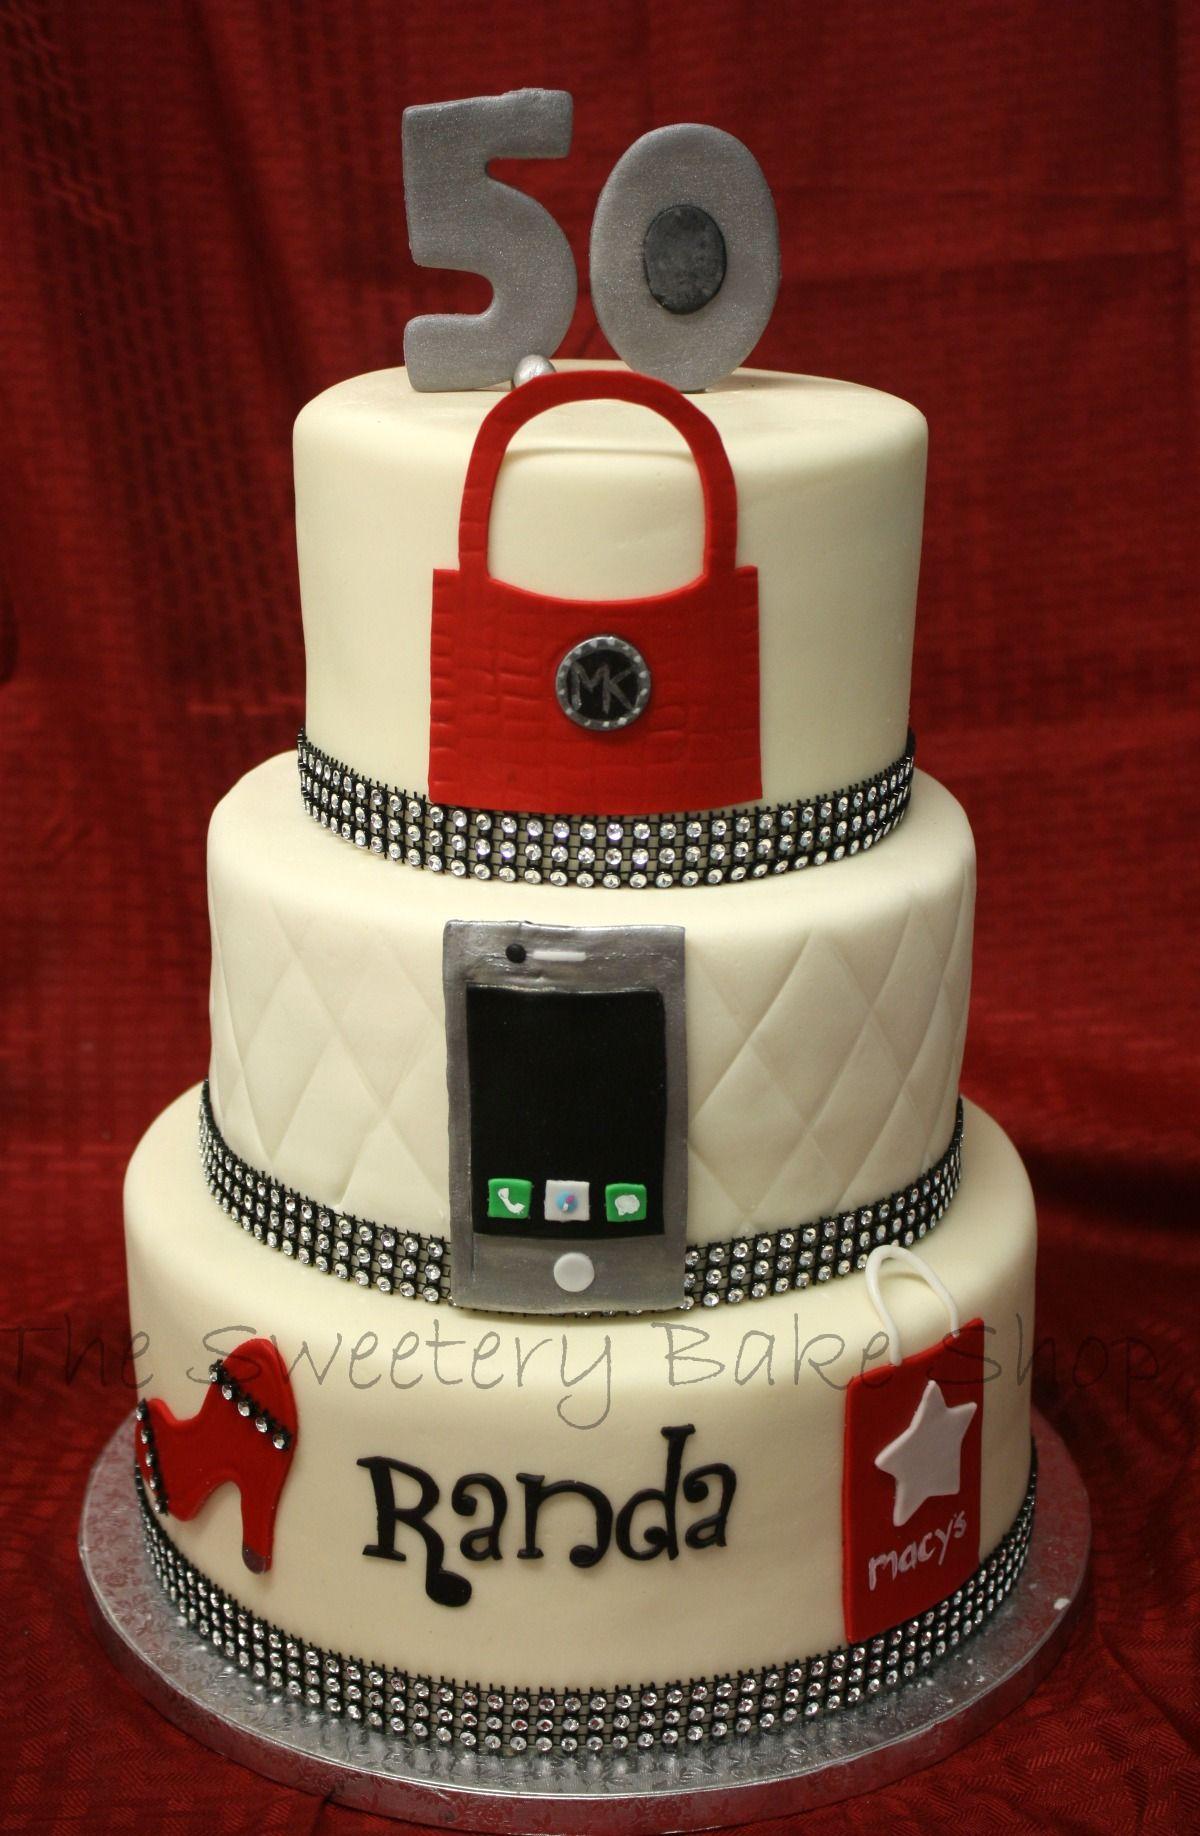 Three Tier Fashion Cake With An Mk Purse Iphone Shoe And Macys